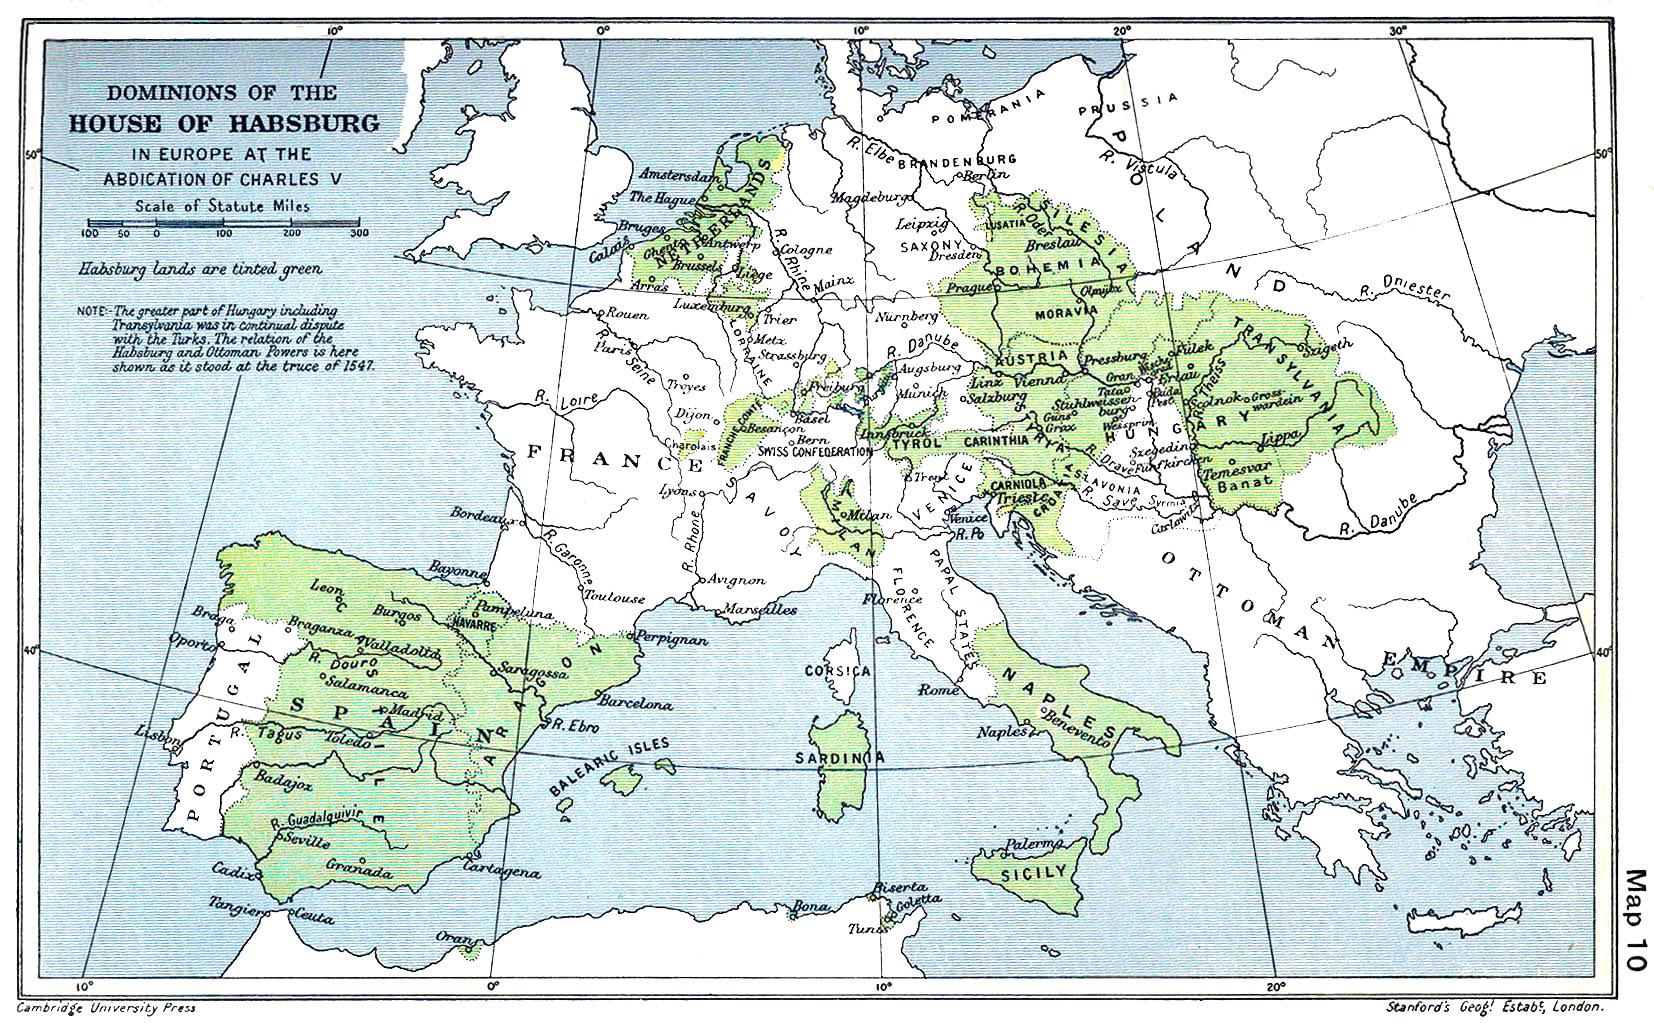 Habsburg (Hapsburg) Empire - European Territory, 1547